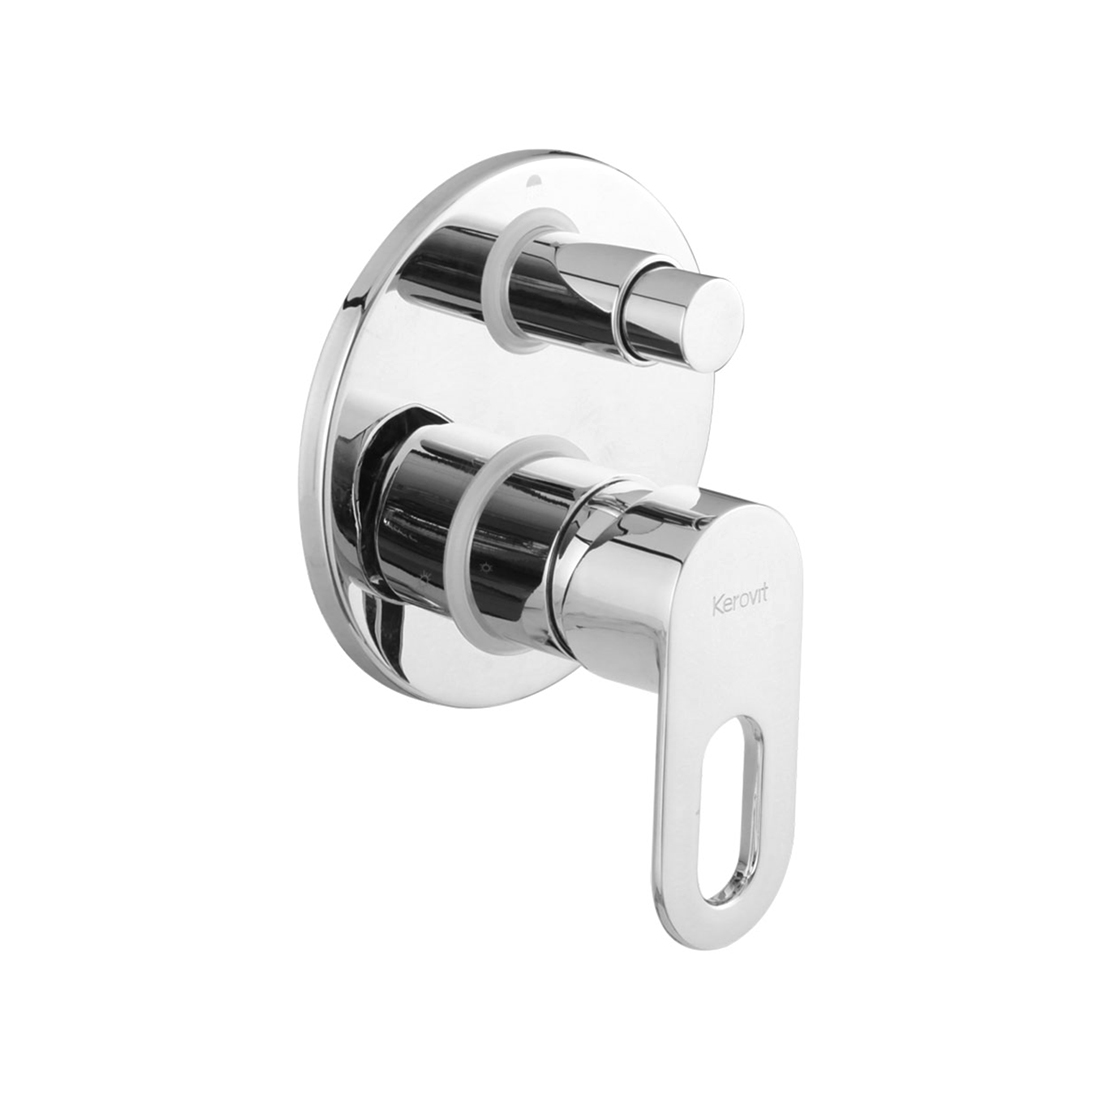 Kerovit Trendy KB2111014 Single Lever 2-Inlet Concealed Bath and Shower Mixer Trim